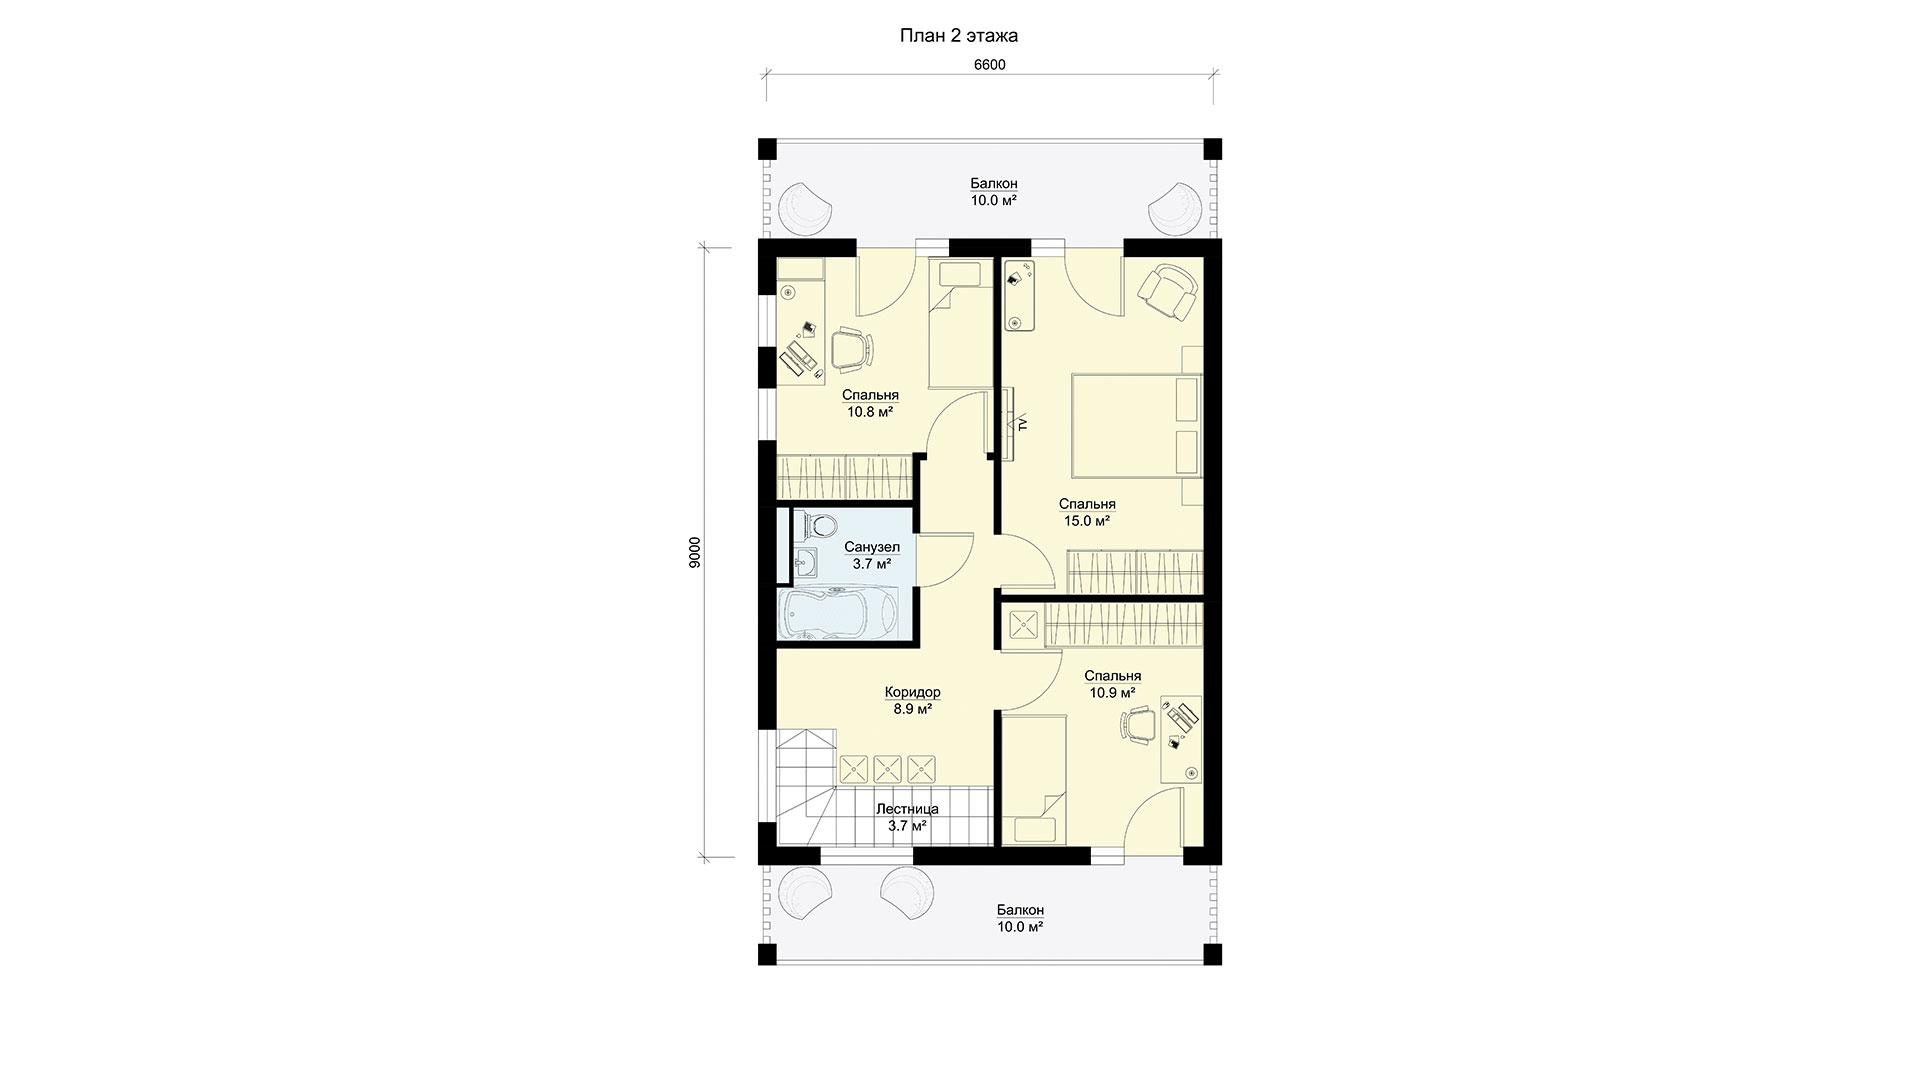 План второго этажа двухэтажного дома БЭНПАН, проект МС-144.